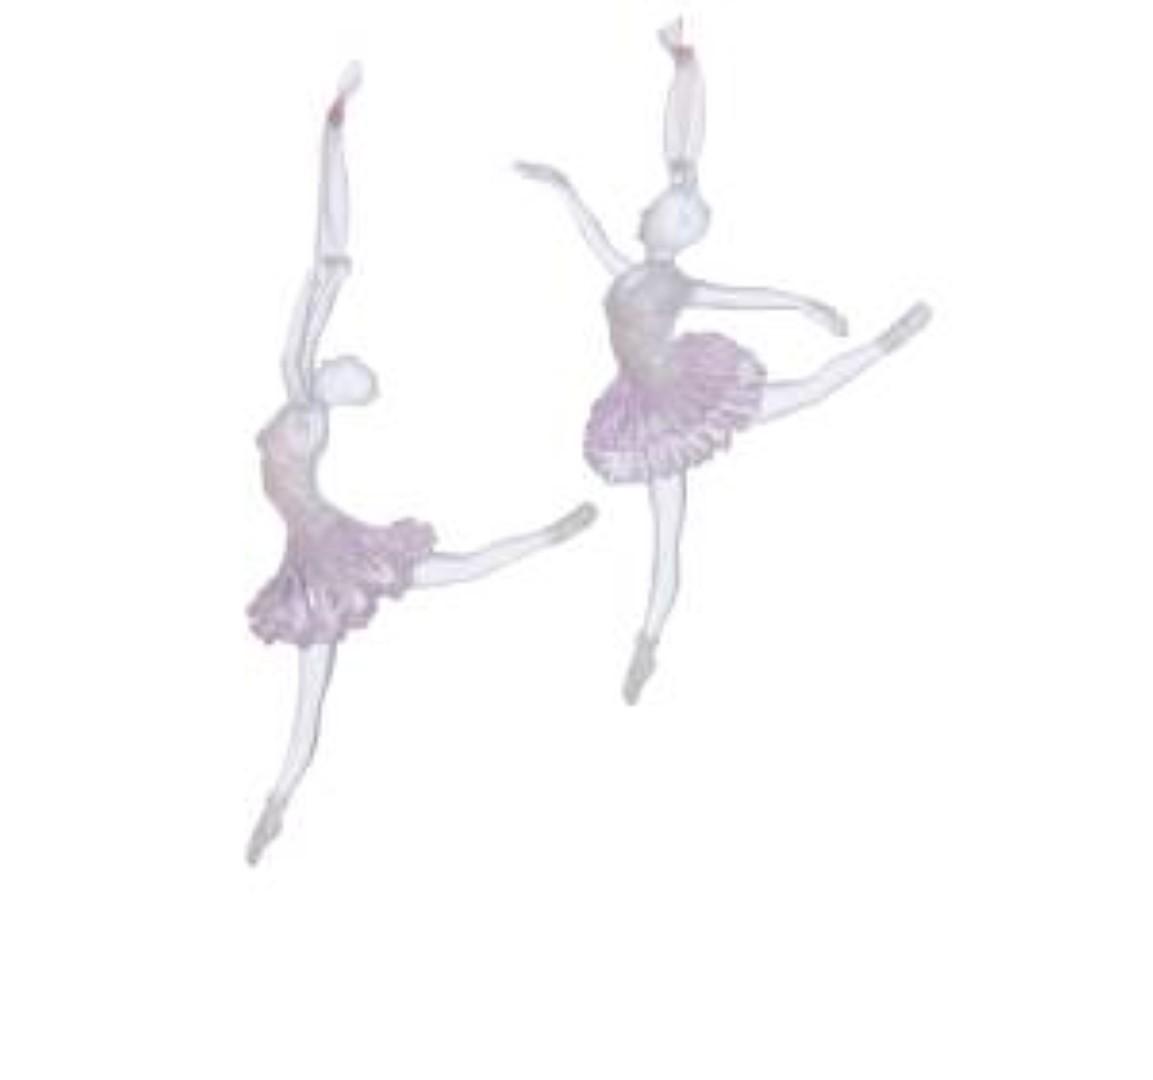 Ballerina Acrylic Clear & Pink 5.25 x 5.75 Inch